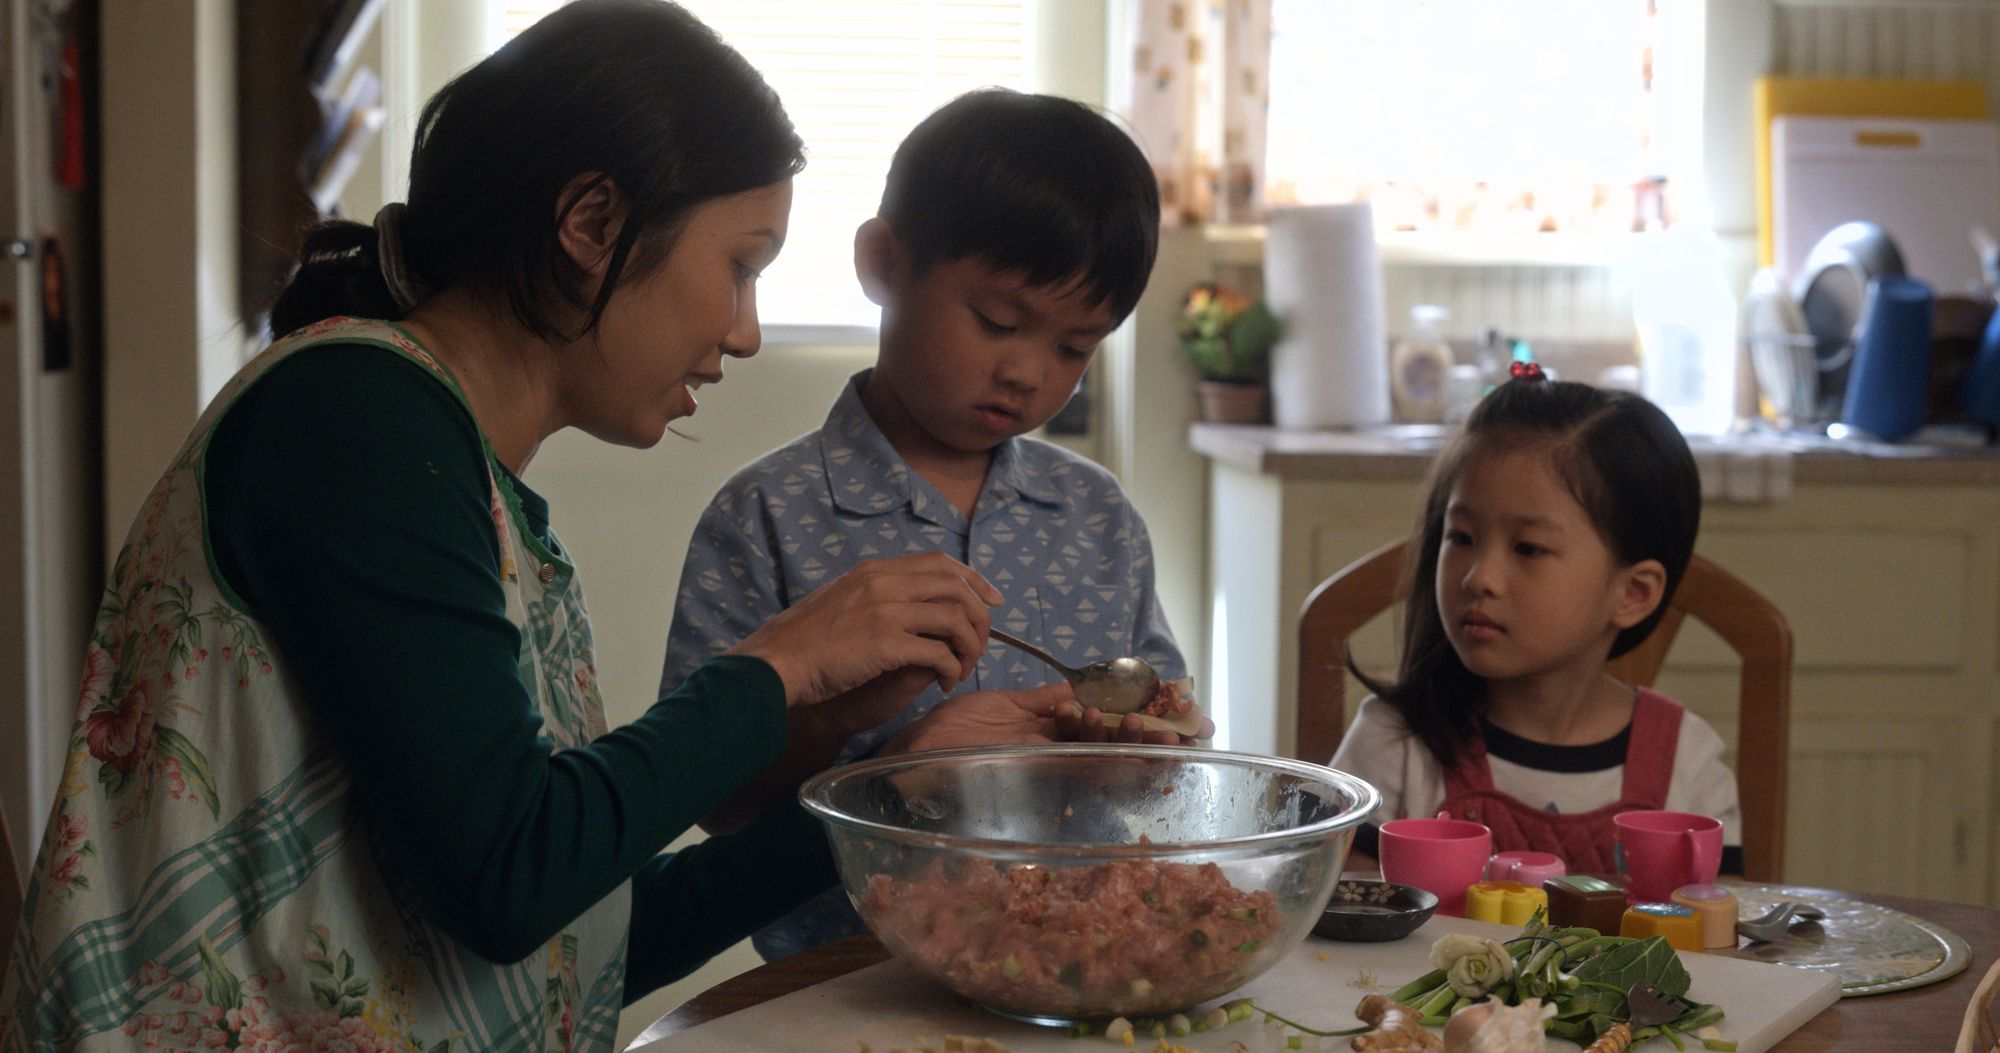 EP07/《The Grand Prize Expo Winners》:一名來自新加坡的單親媽媽贏得一次費用全免的阿拉斯加郵輪之旅。她和兩個孩子在這場情感宣洩的旅程,一嚐美好生活滋味。